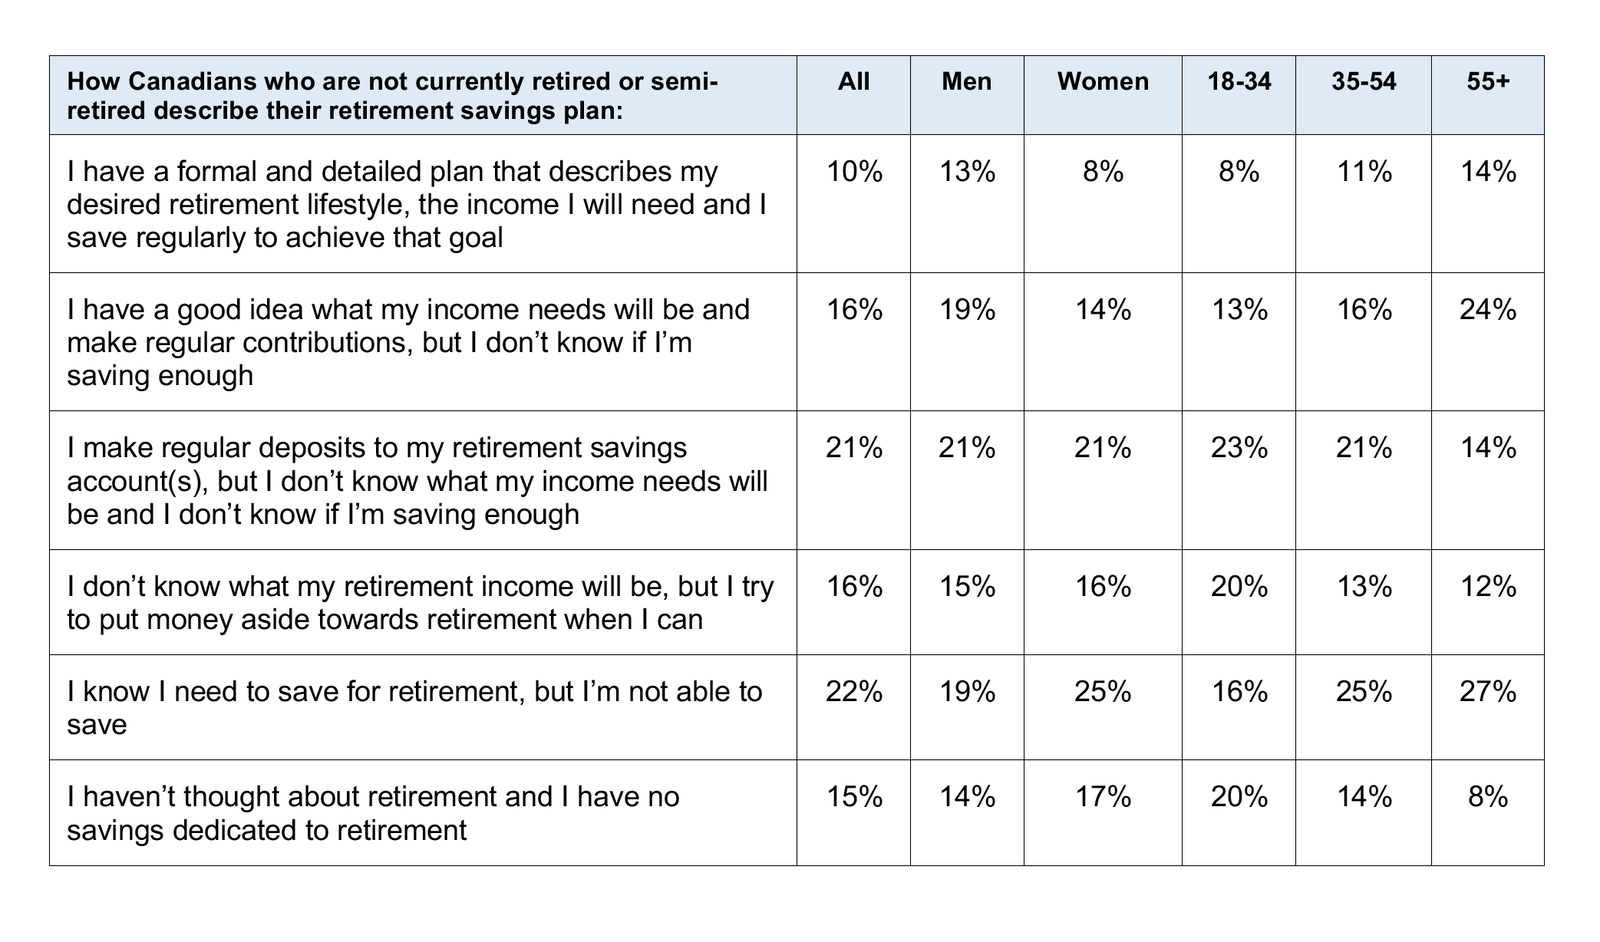 Canadians describe their retirement savings plan - chart